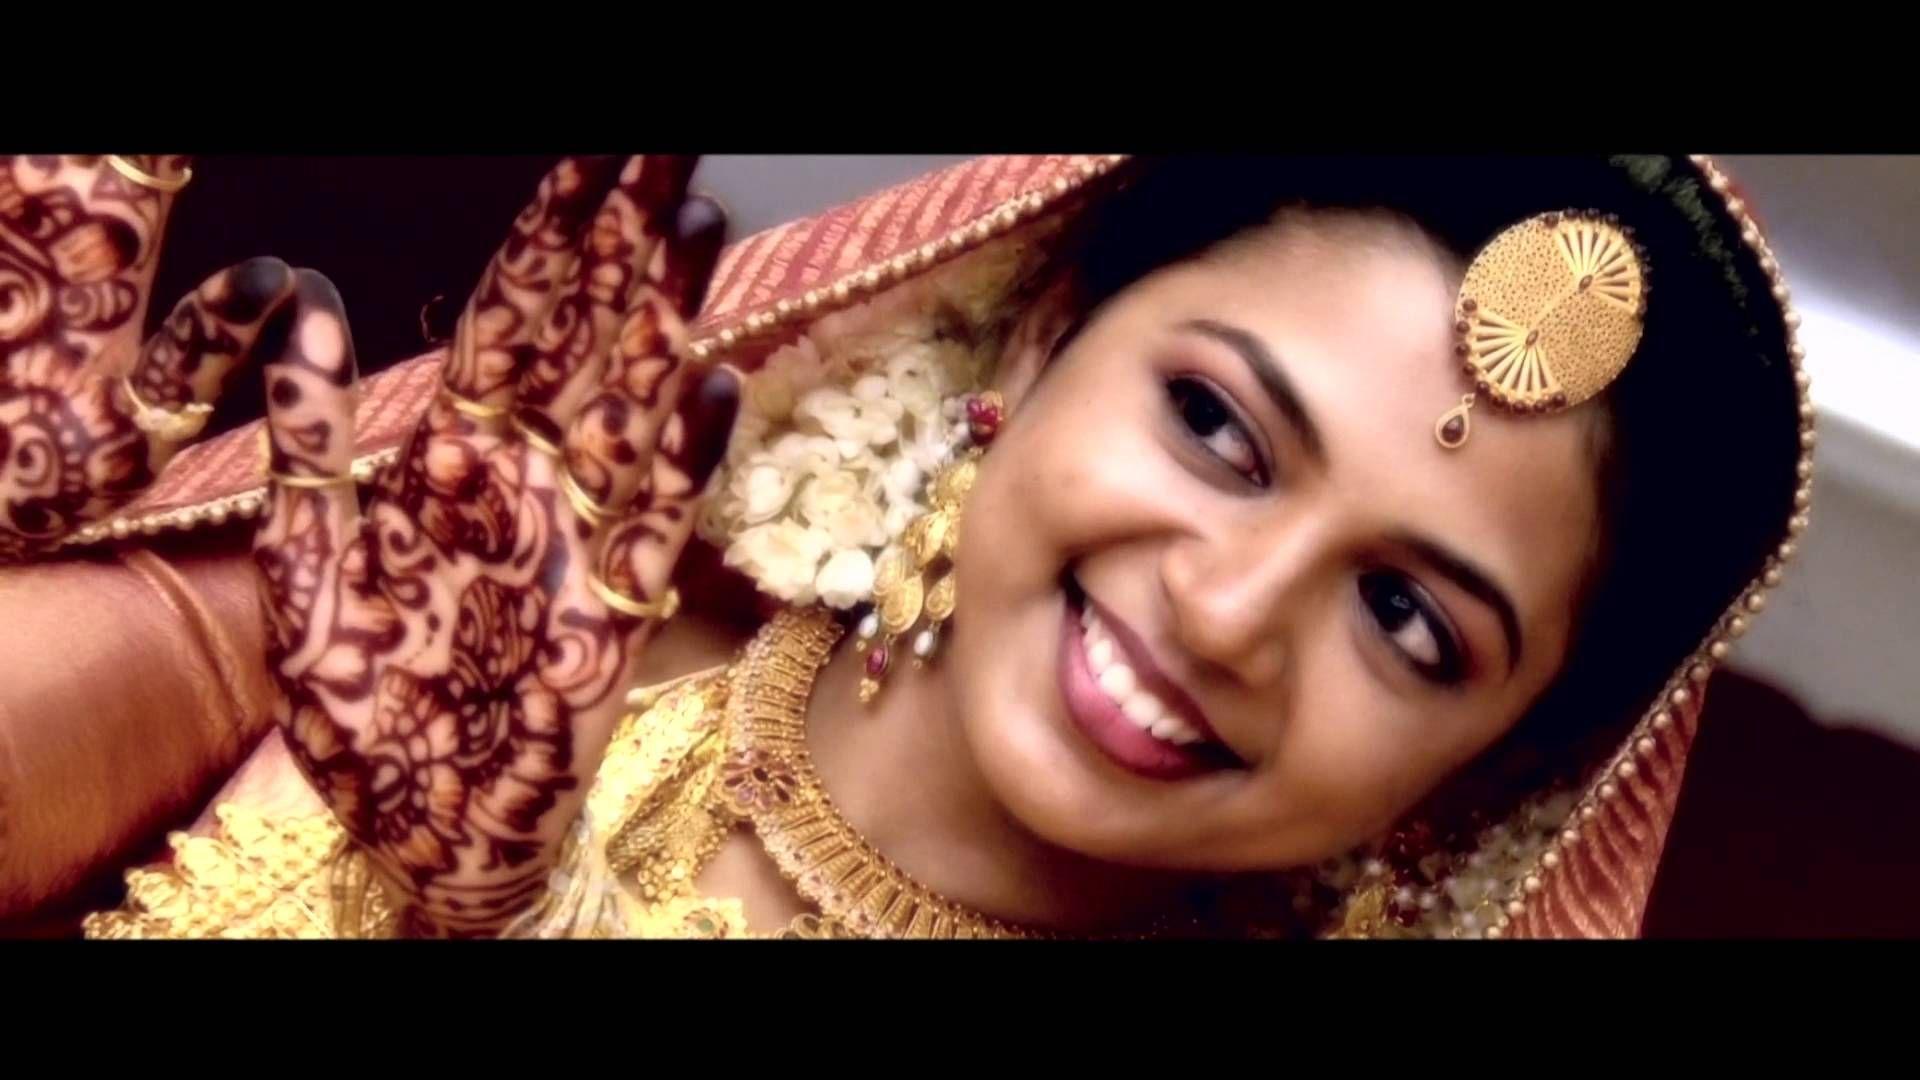 Kerala wedding photos muslim wedding photos wedding kerala wedding - Most Popular Muslim Matrimony In Kerala Http Www Intimatematrimony Com Most Popularmuslimislamickeralamarriage